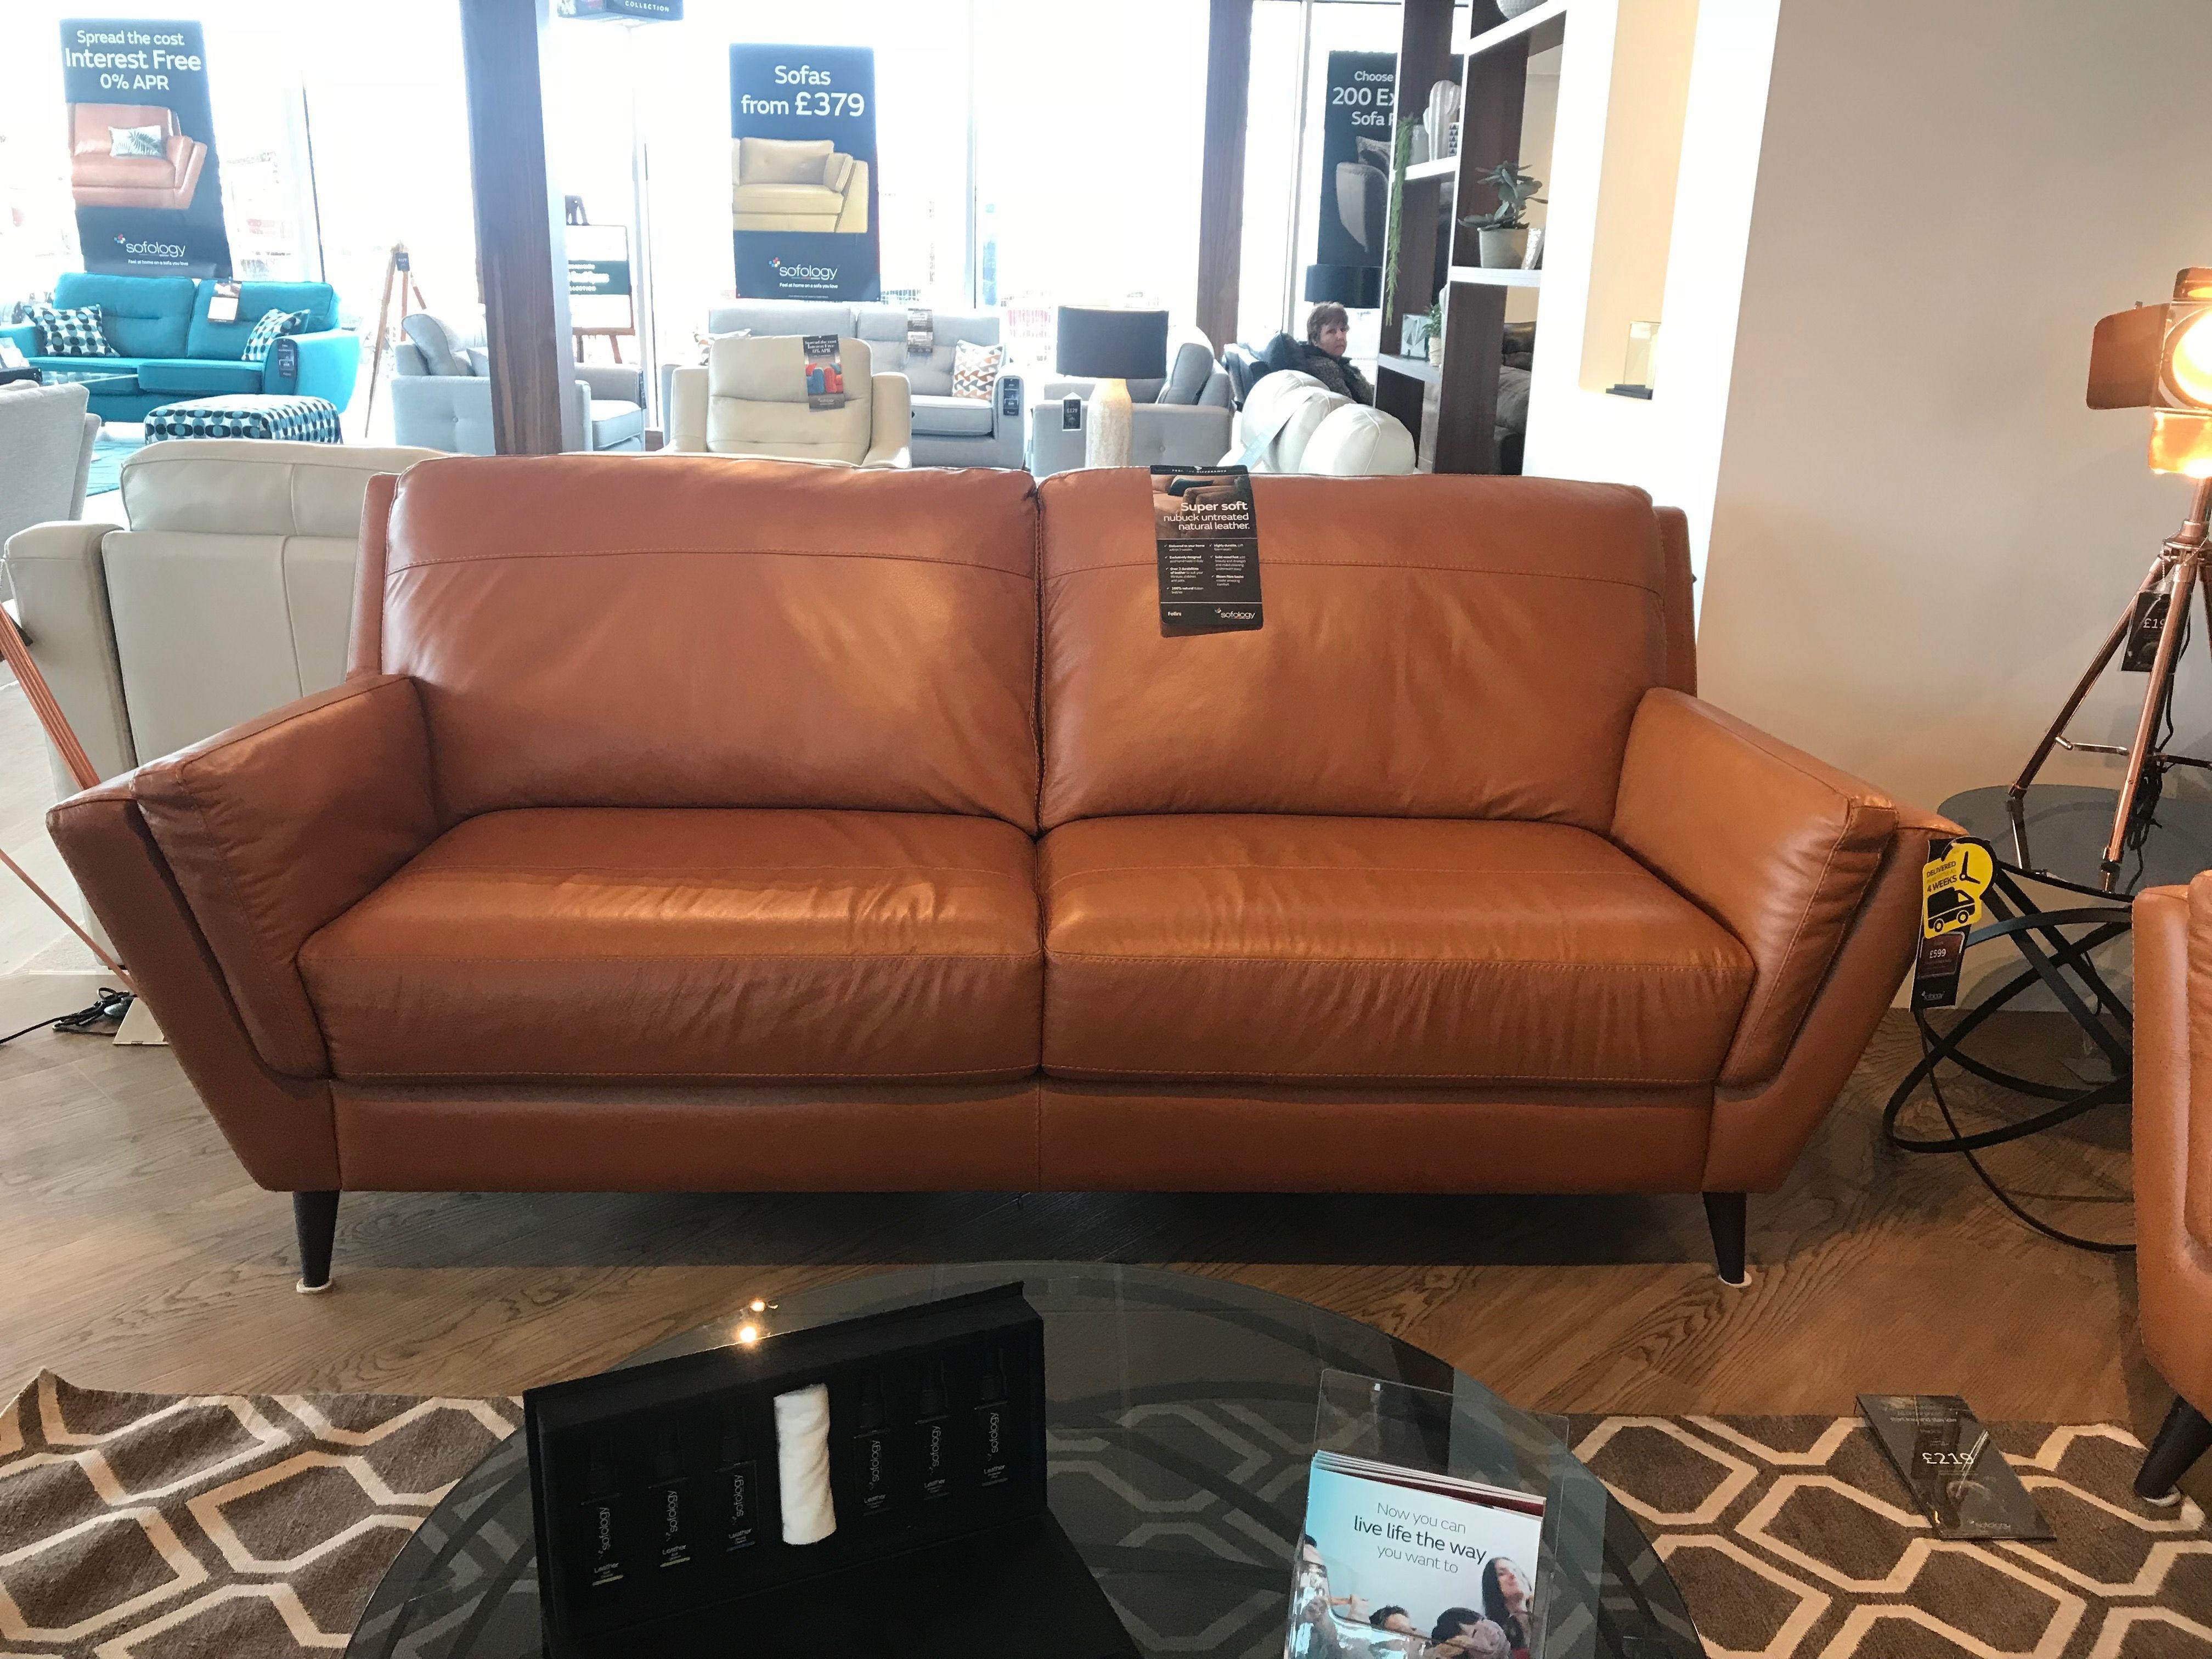 Fellini 3 Seater Sofa Sofa Sofa Bed Large Sofa with regard to size 4032 X 3024